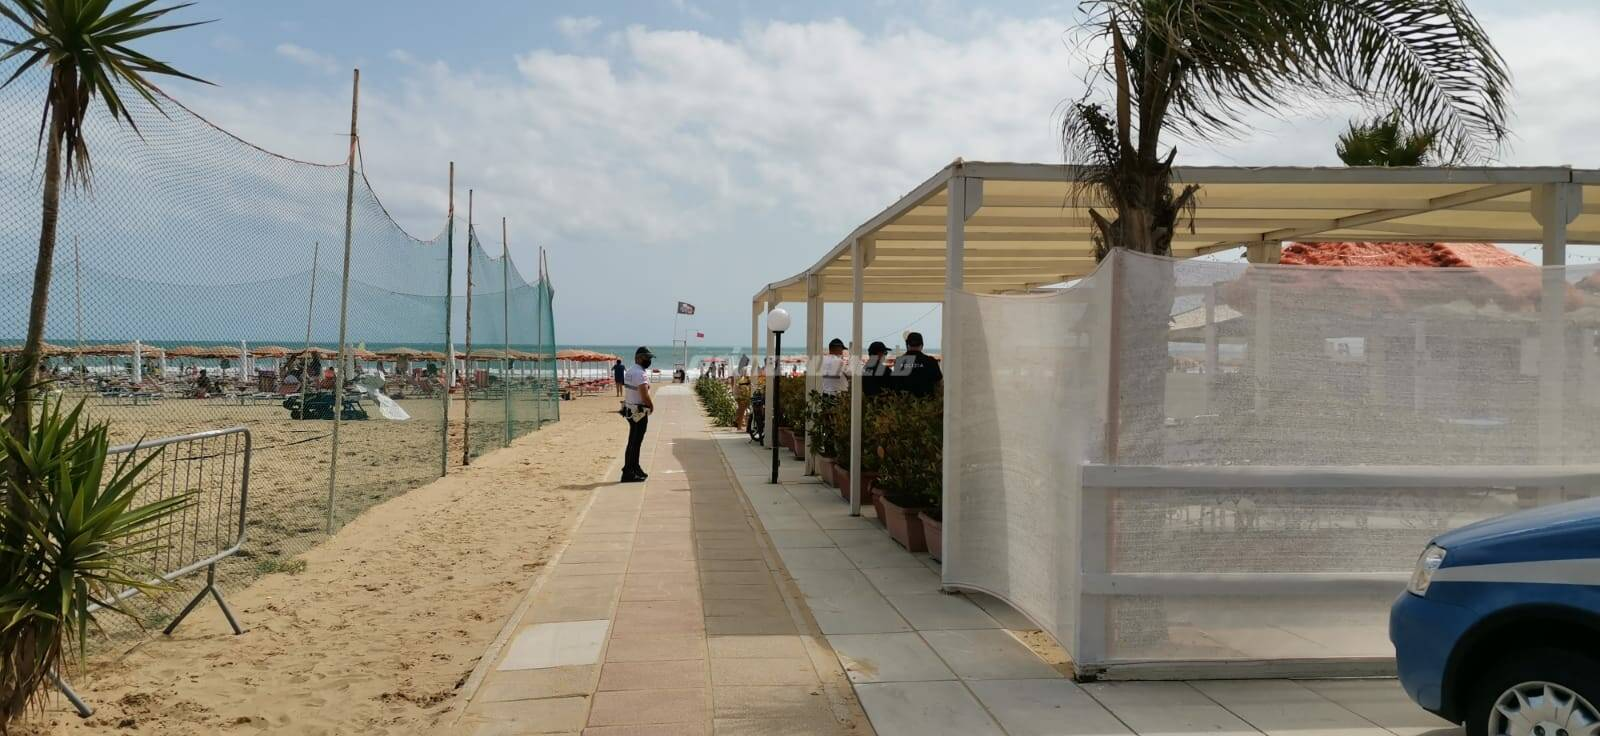 polizia spiaggia rio vivo